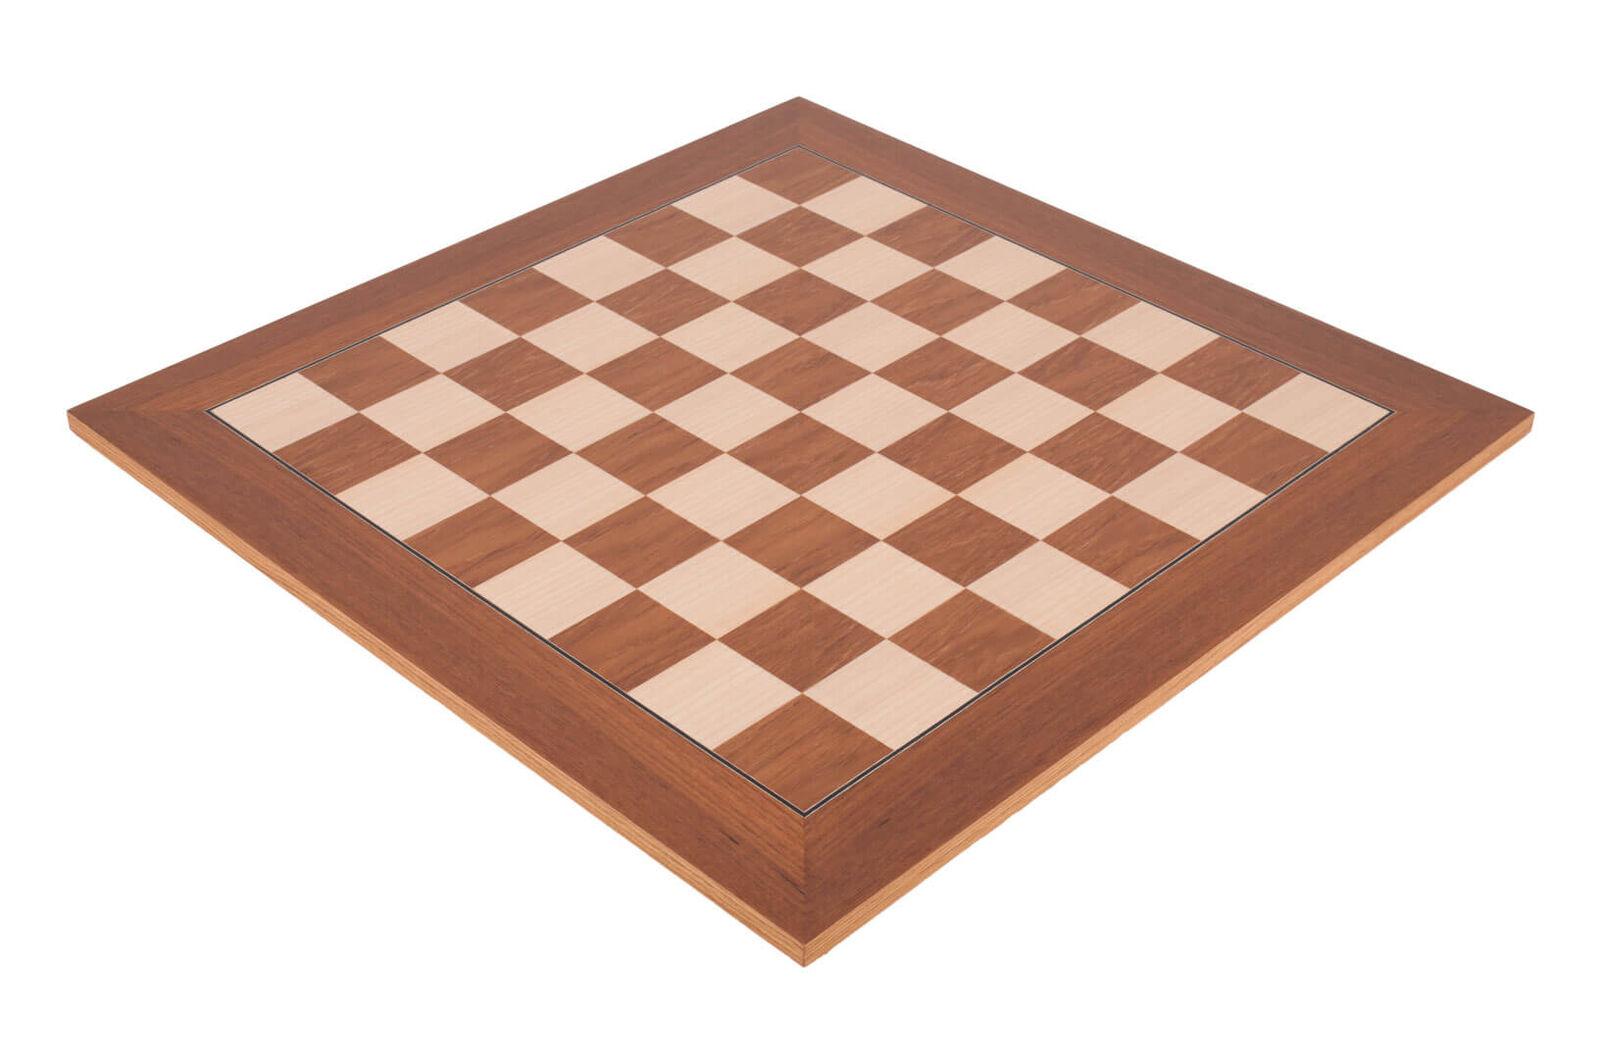 Teak Standard Traditional Chess Board - 2.75